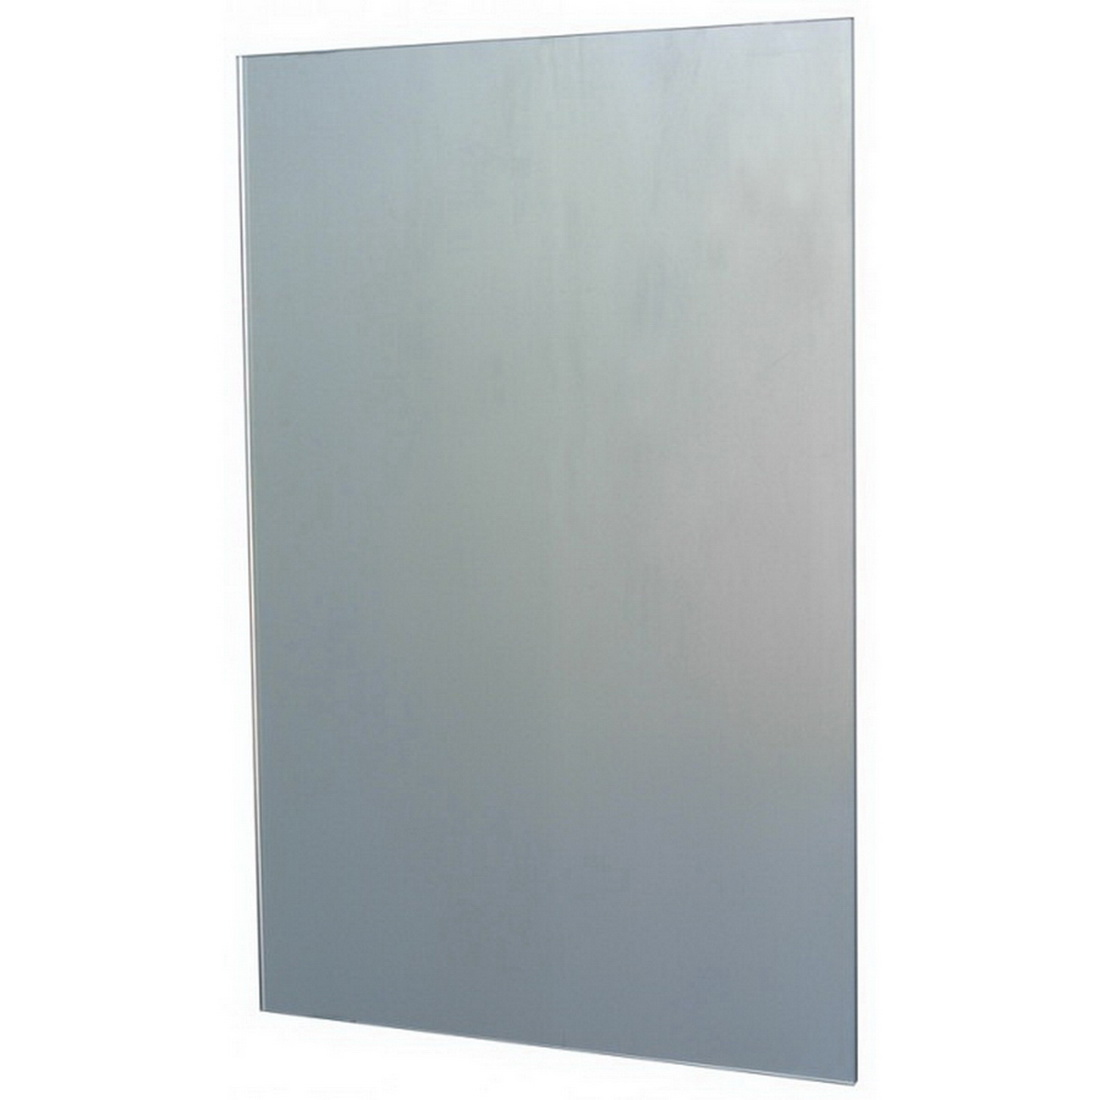 Styline Beveled Edge Mirror 900 x 750mm 9X75STYBEV